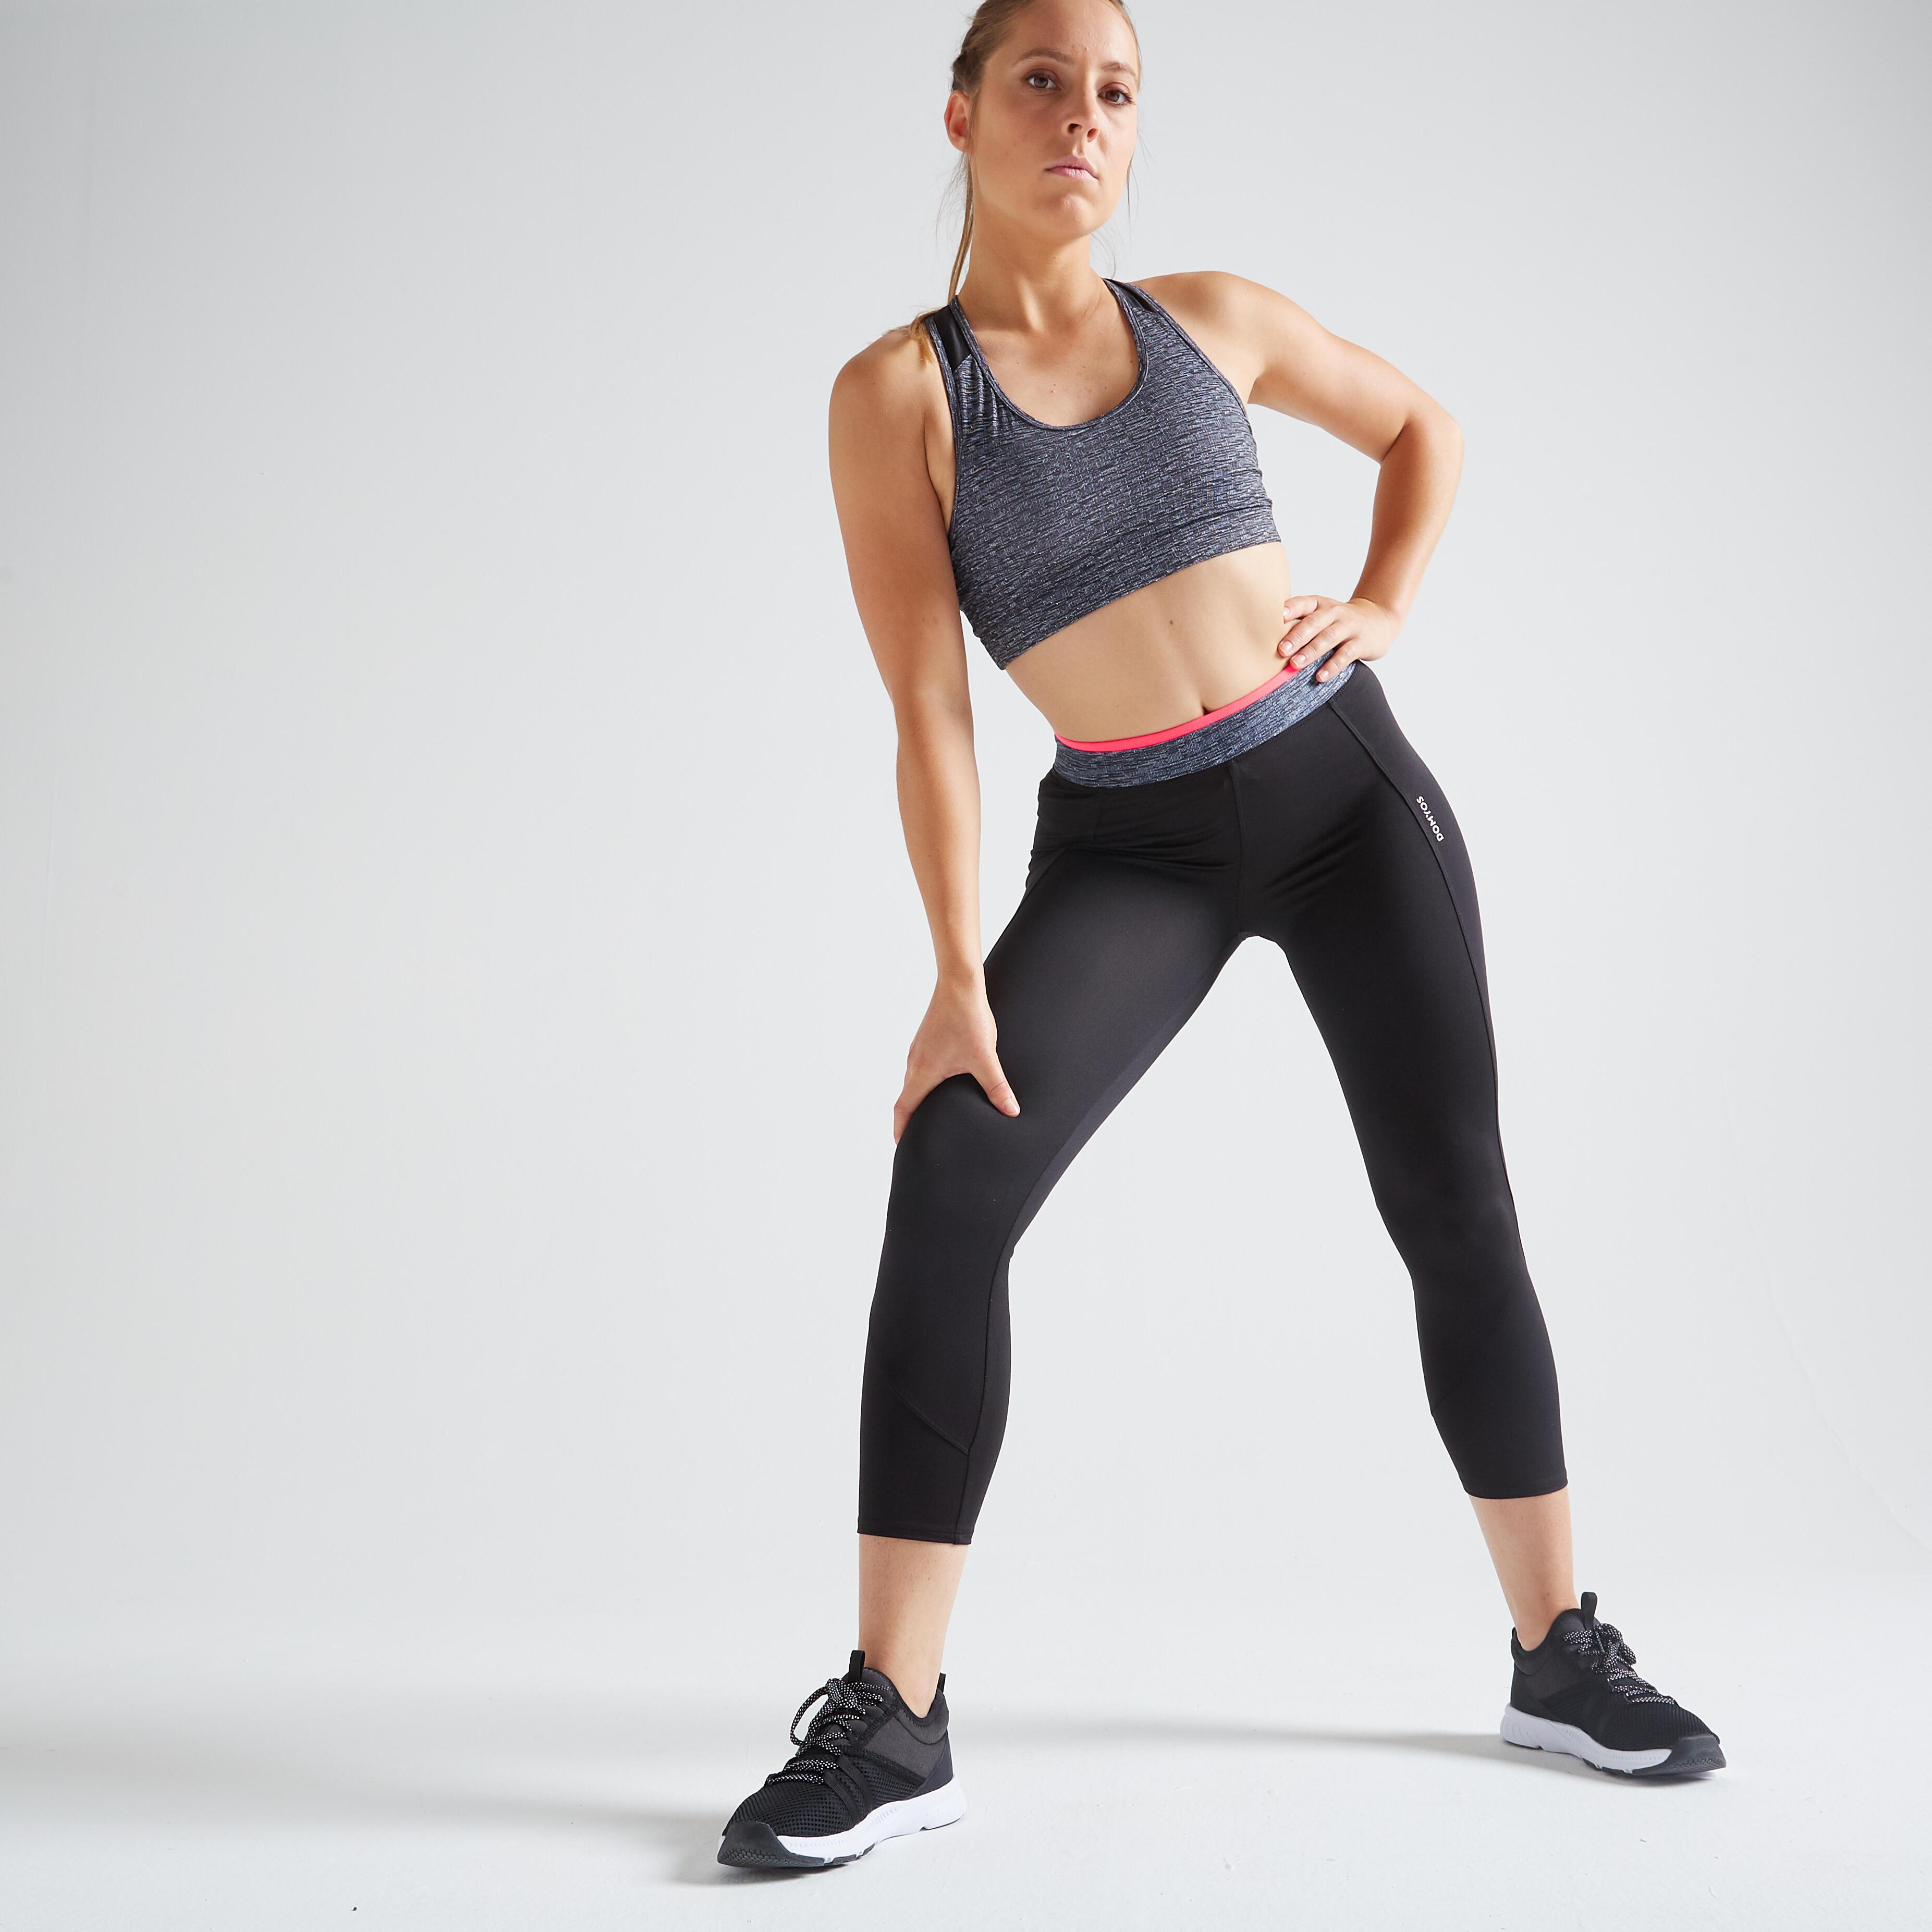 Domyos Legging 7/8 fitness cardio training femme noir 100 - Domyos